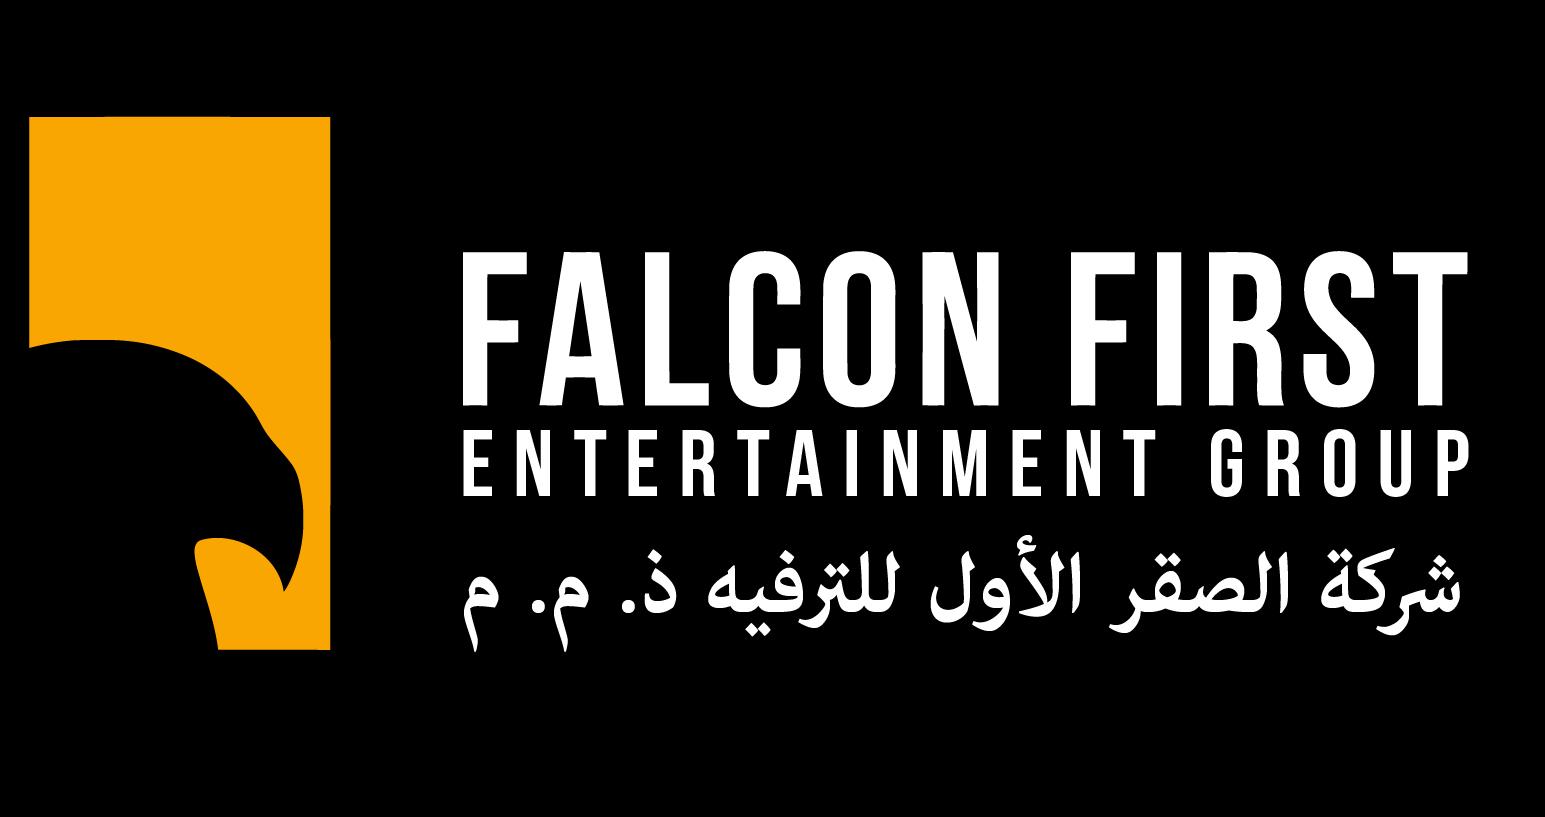 Falcon First Entertainment